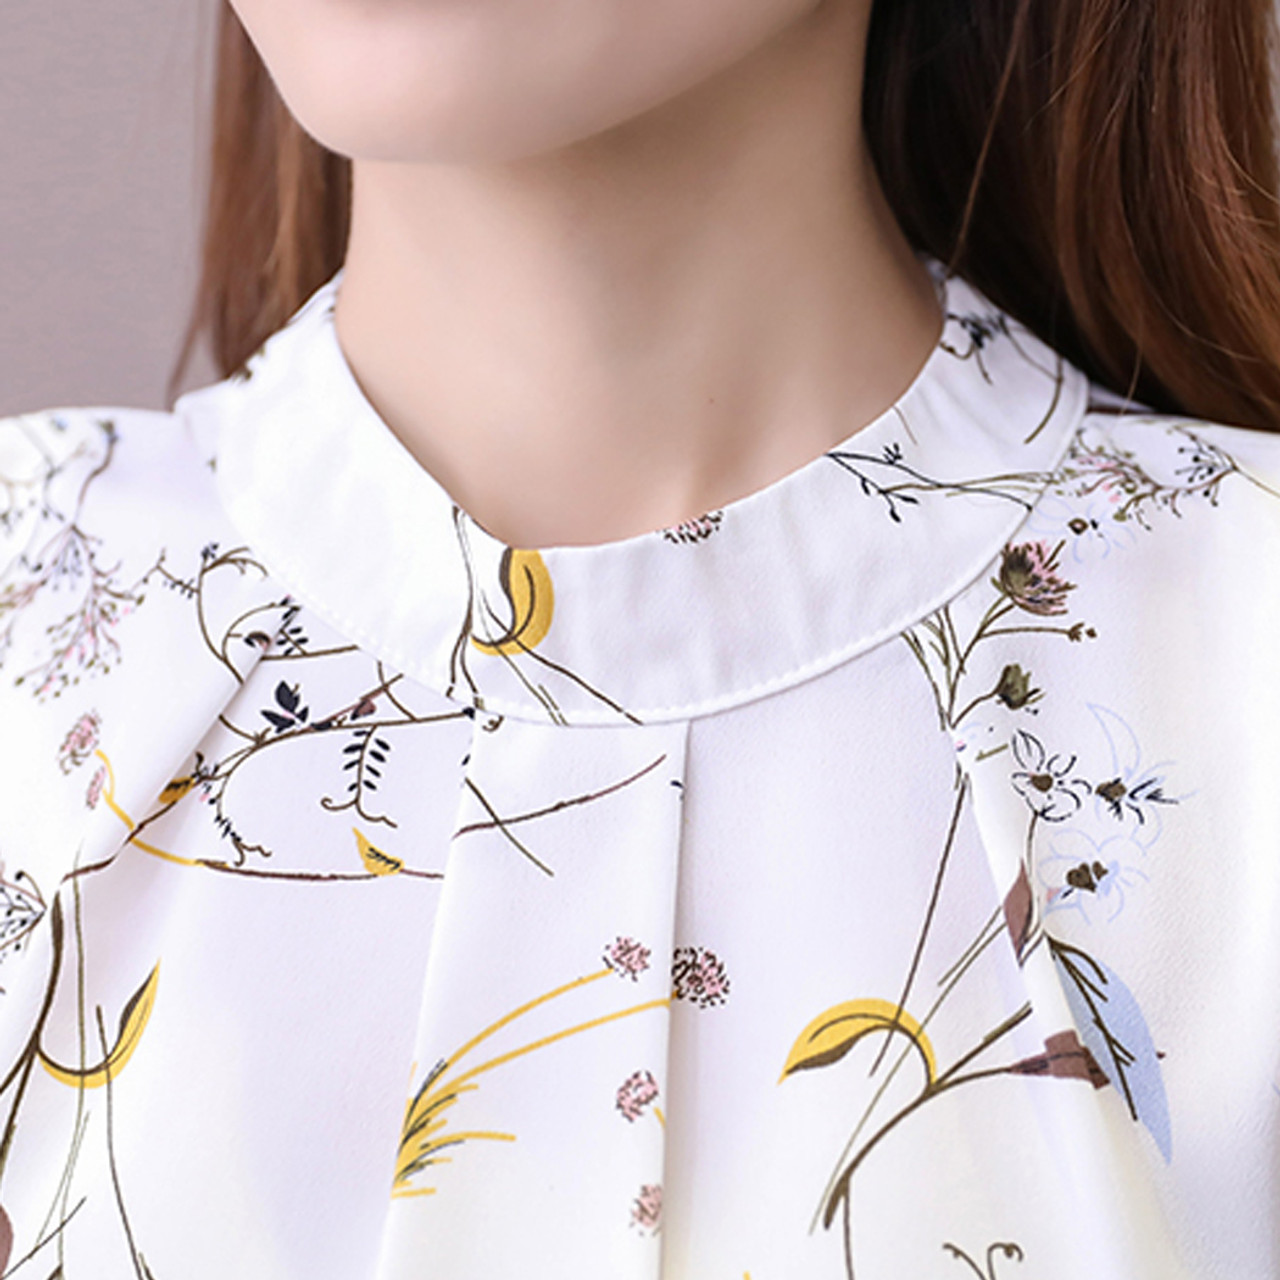 027f94d9825 ... 2018 Summer Cold Shoulder Chiffon Floral Printed Blouse Shirt Women Tops  Elegant Plus Size Ladies Korea ...